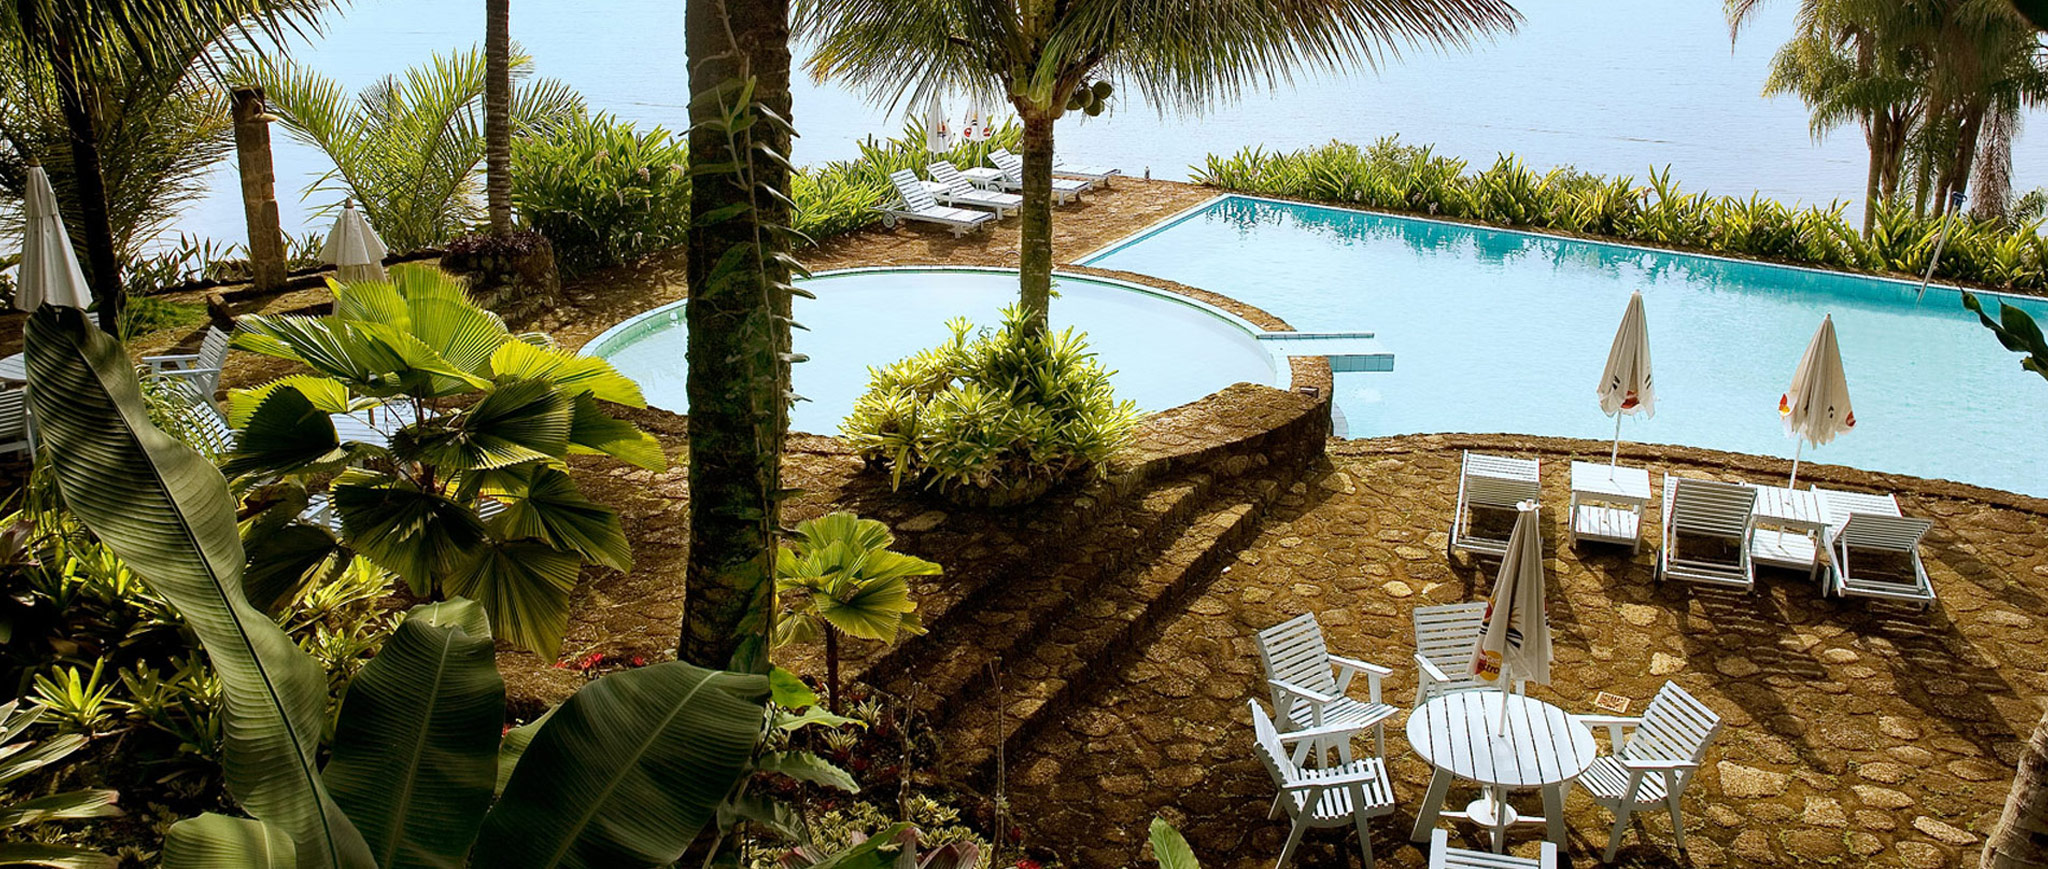 piscina01_2048